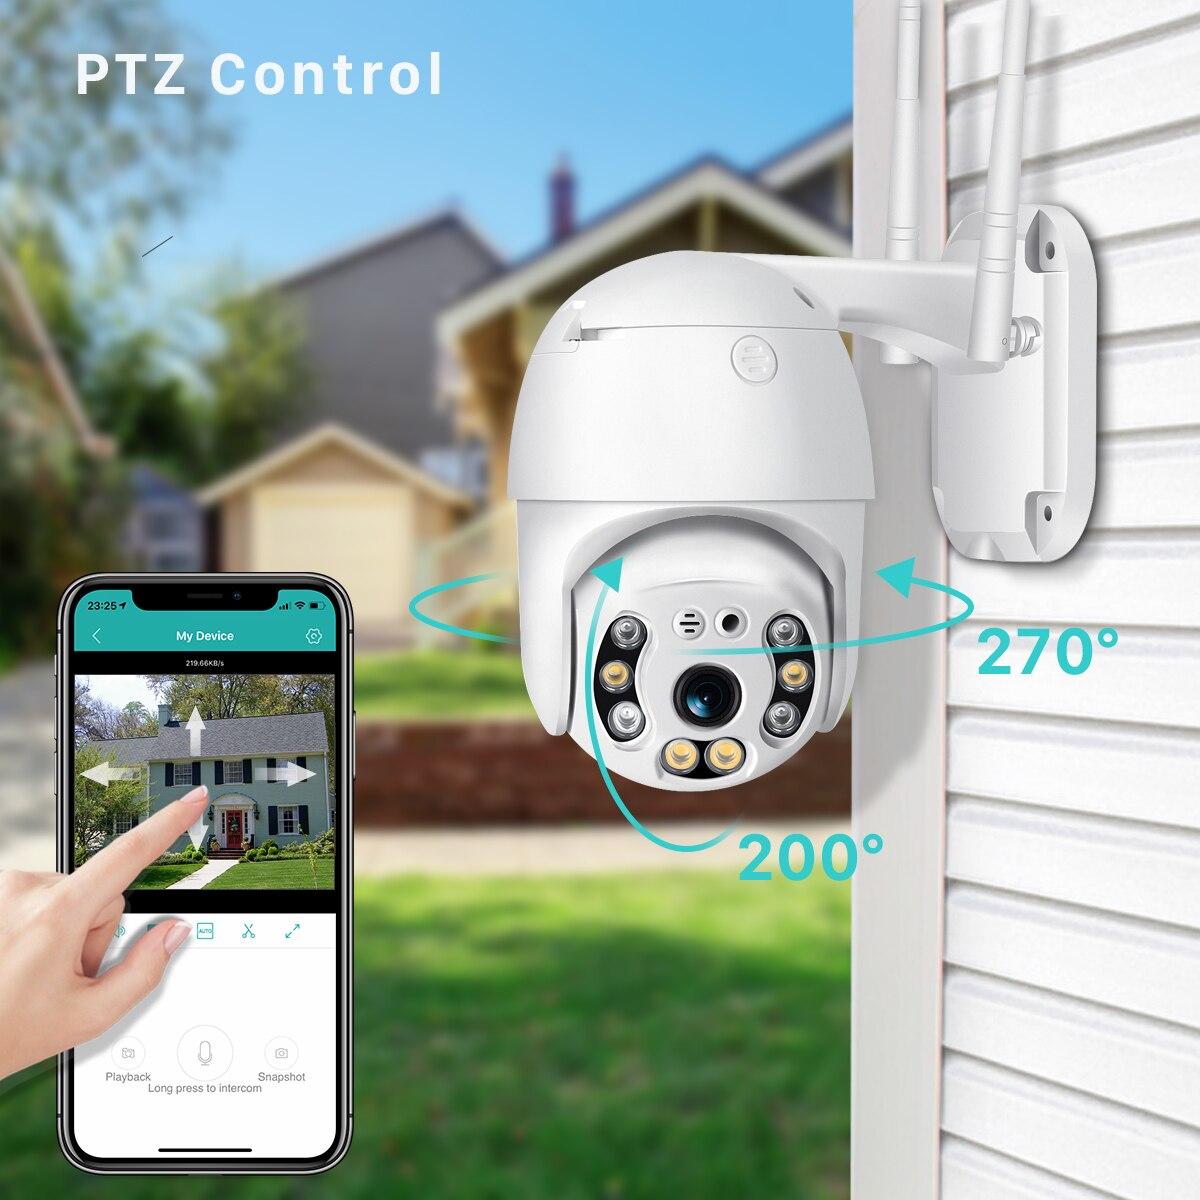 Hd0ad68c436d0408483dcc183f3ba1b8bL BESDER 1080P Outdoor Speed Dome Wifi Camera 2MP H.265 Audio PTZ Wireless Camera Cloud-SD Slot ONVIF Home Surveillance IP Camera